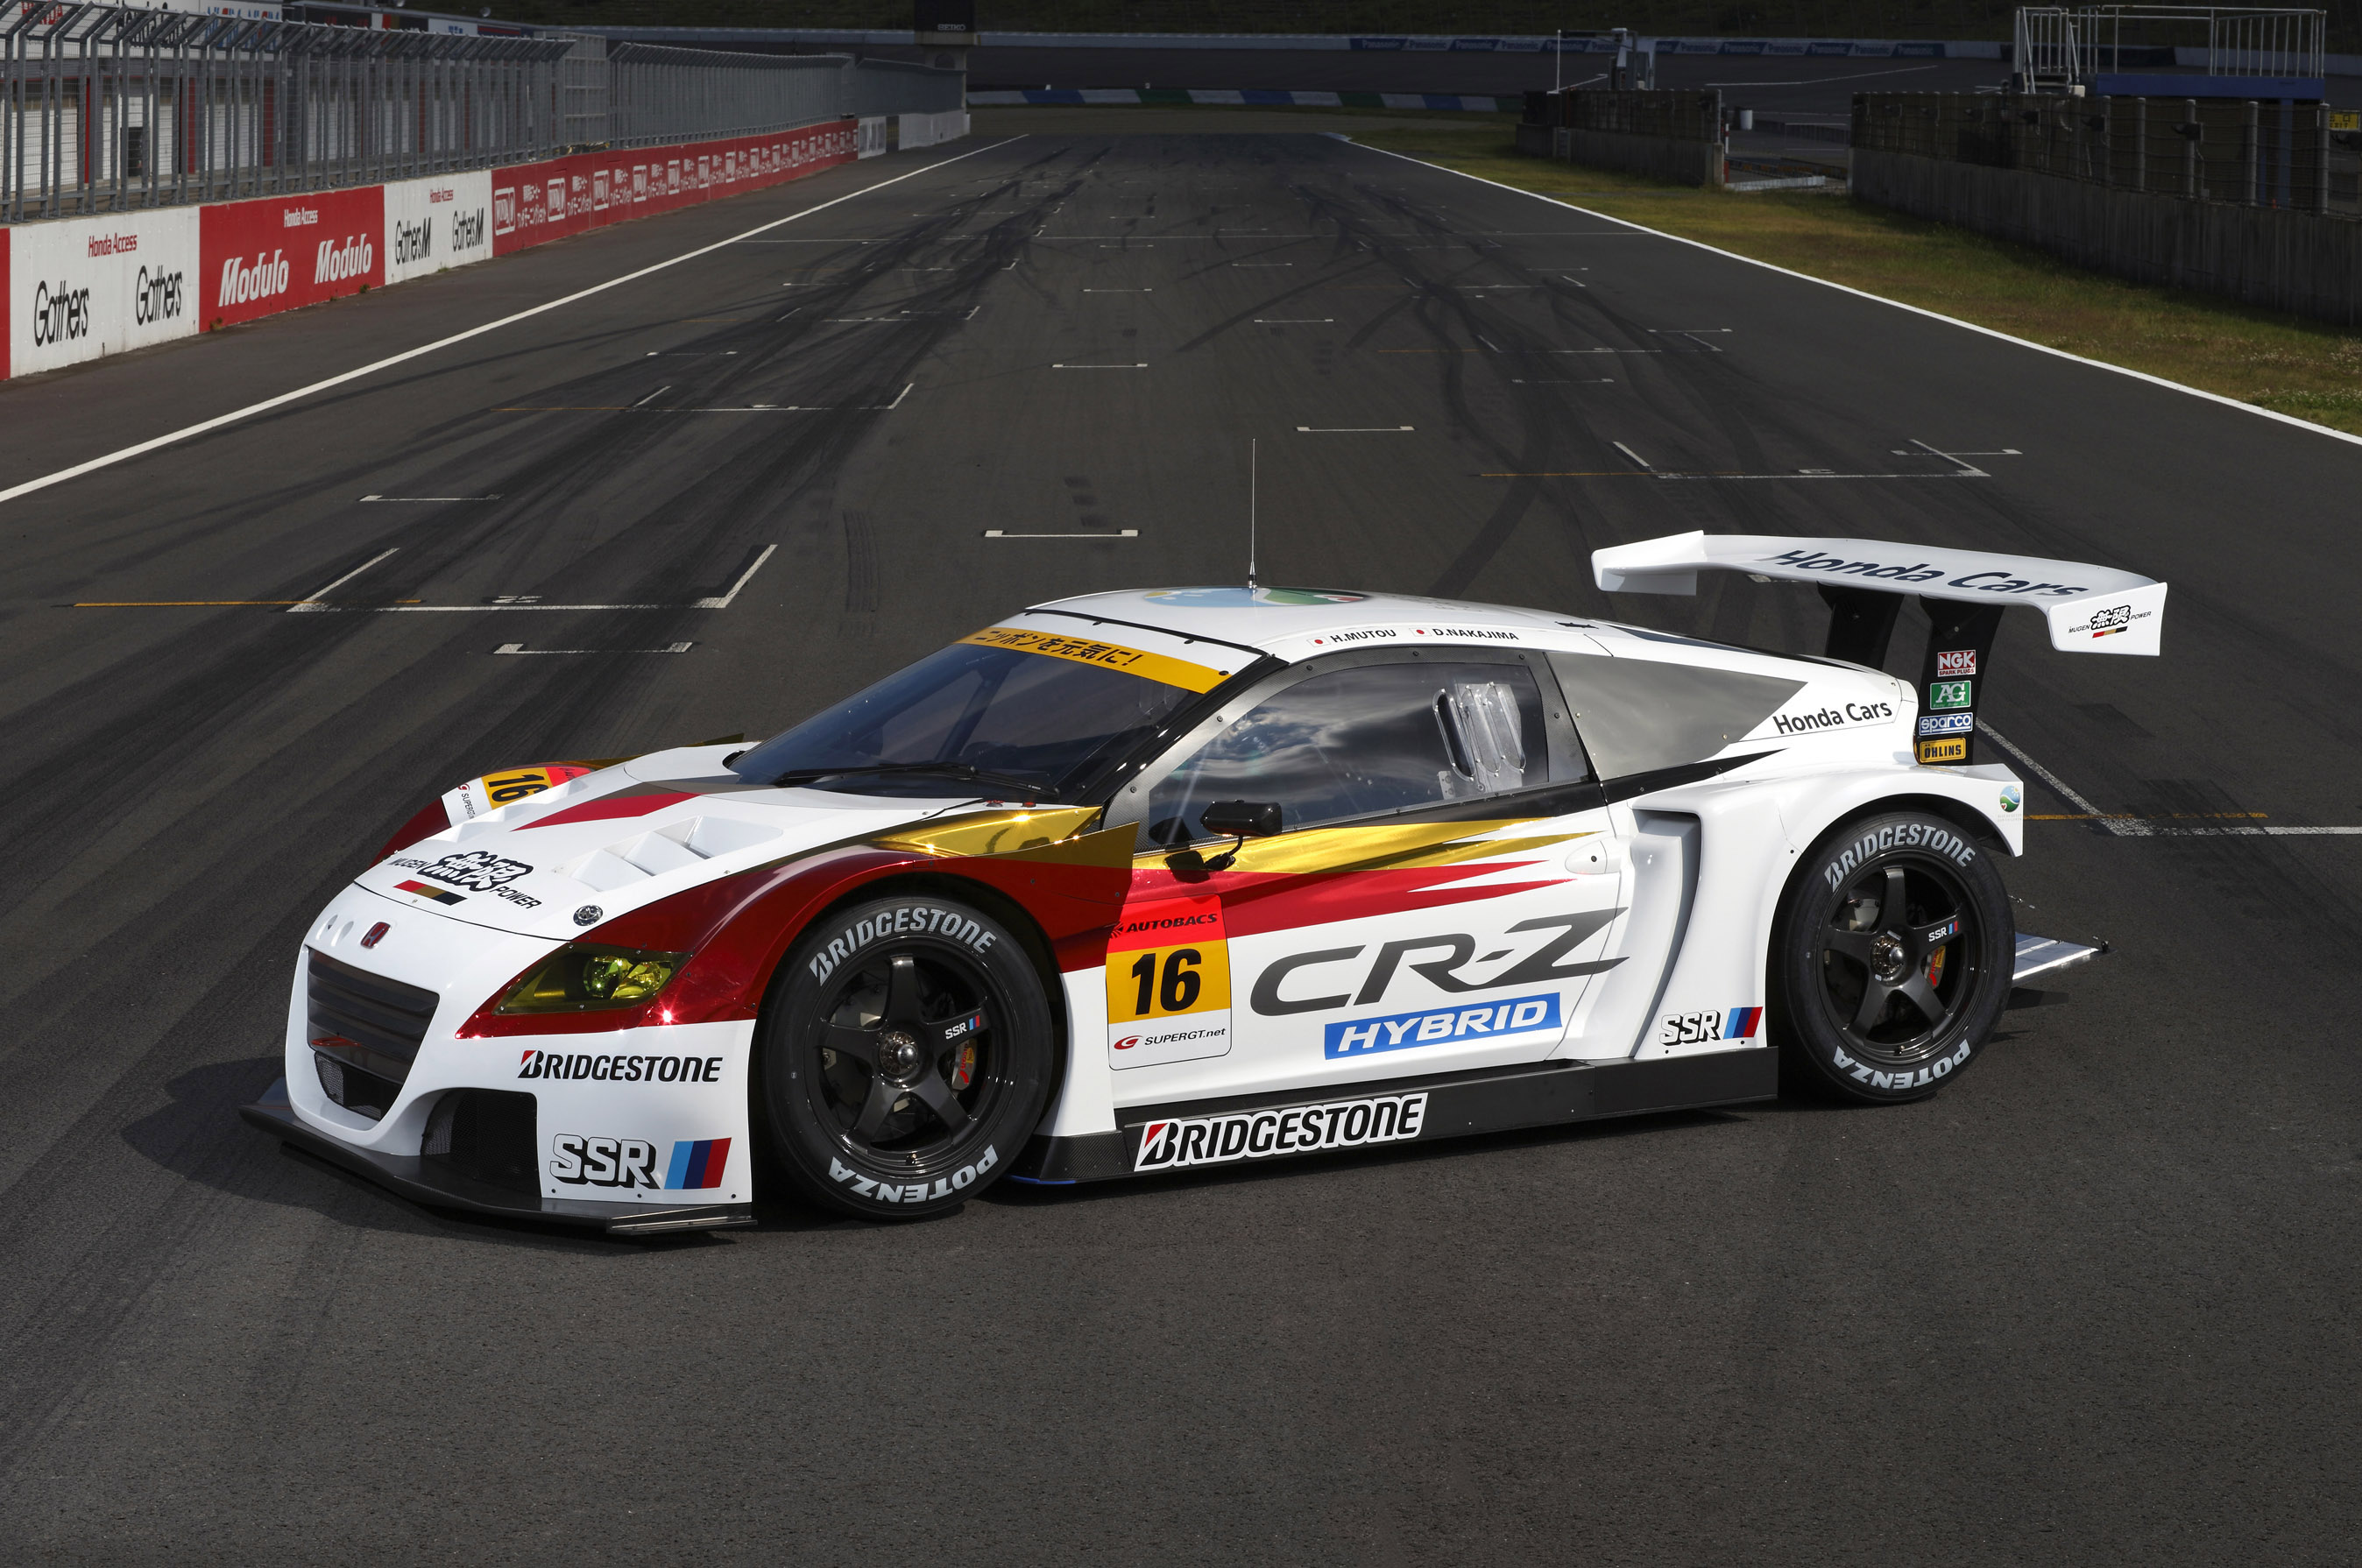 Honda has announced MUGEN CR-Z GT featuring racing hybrid system